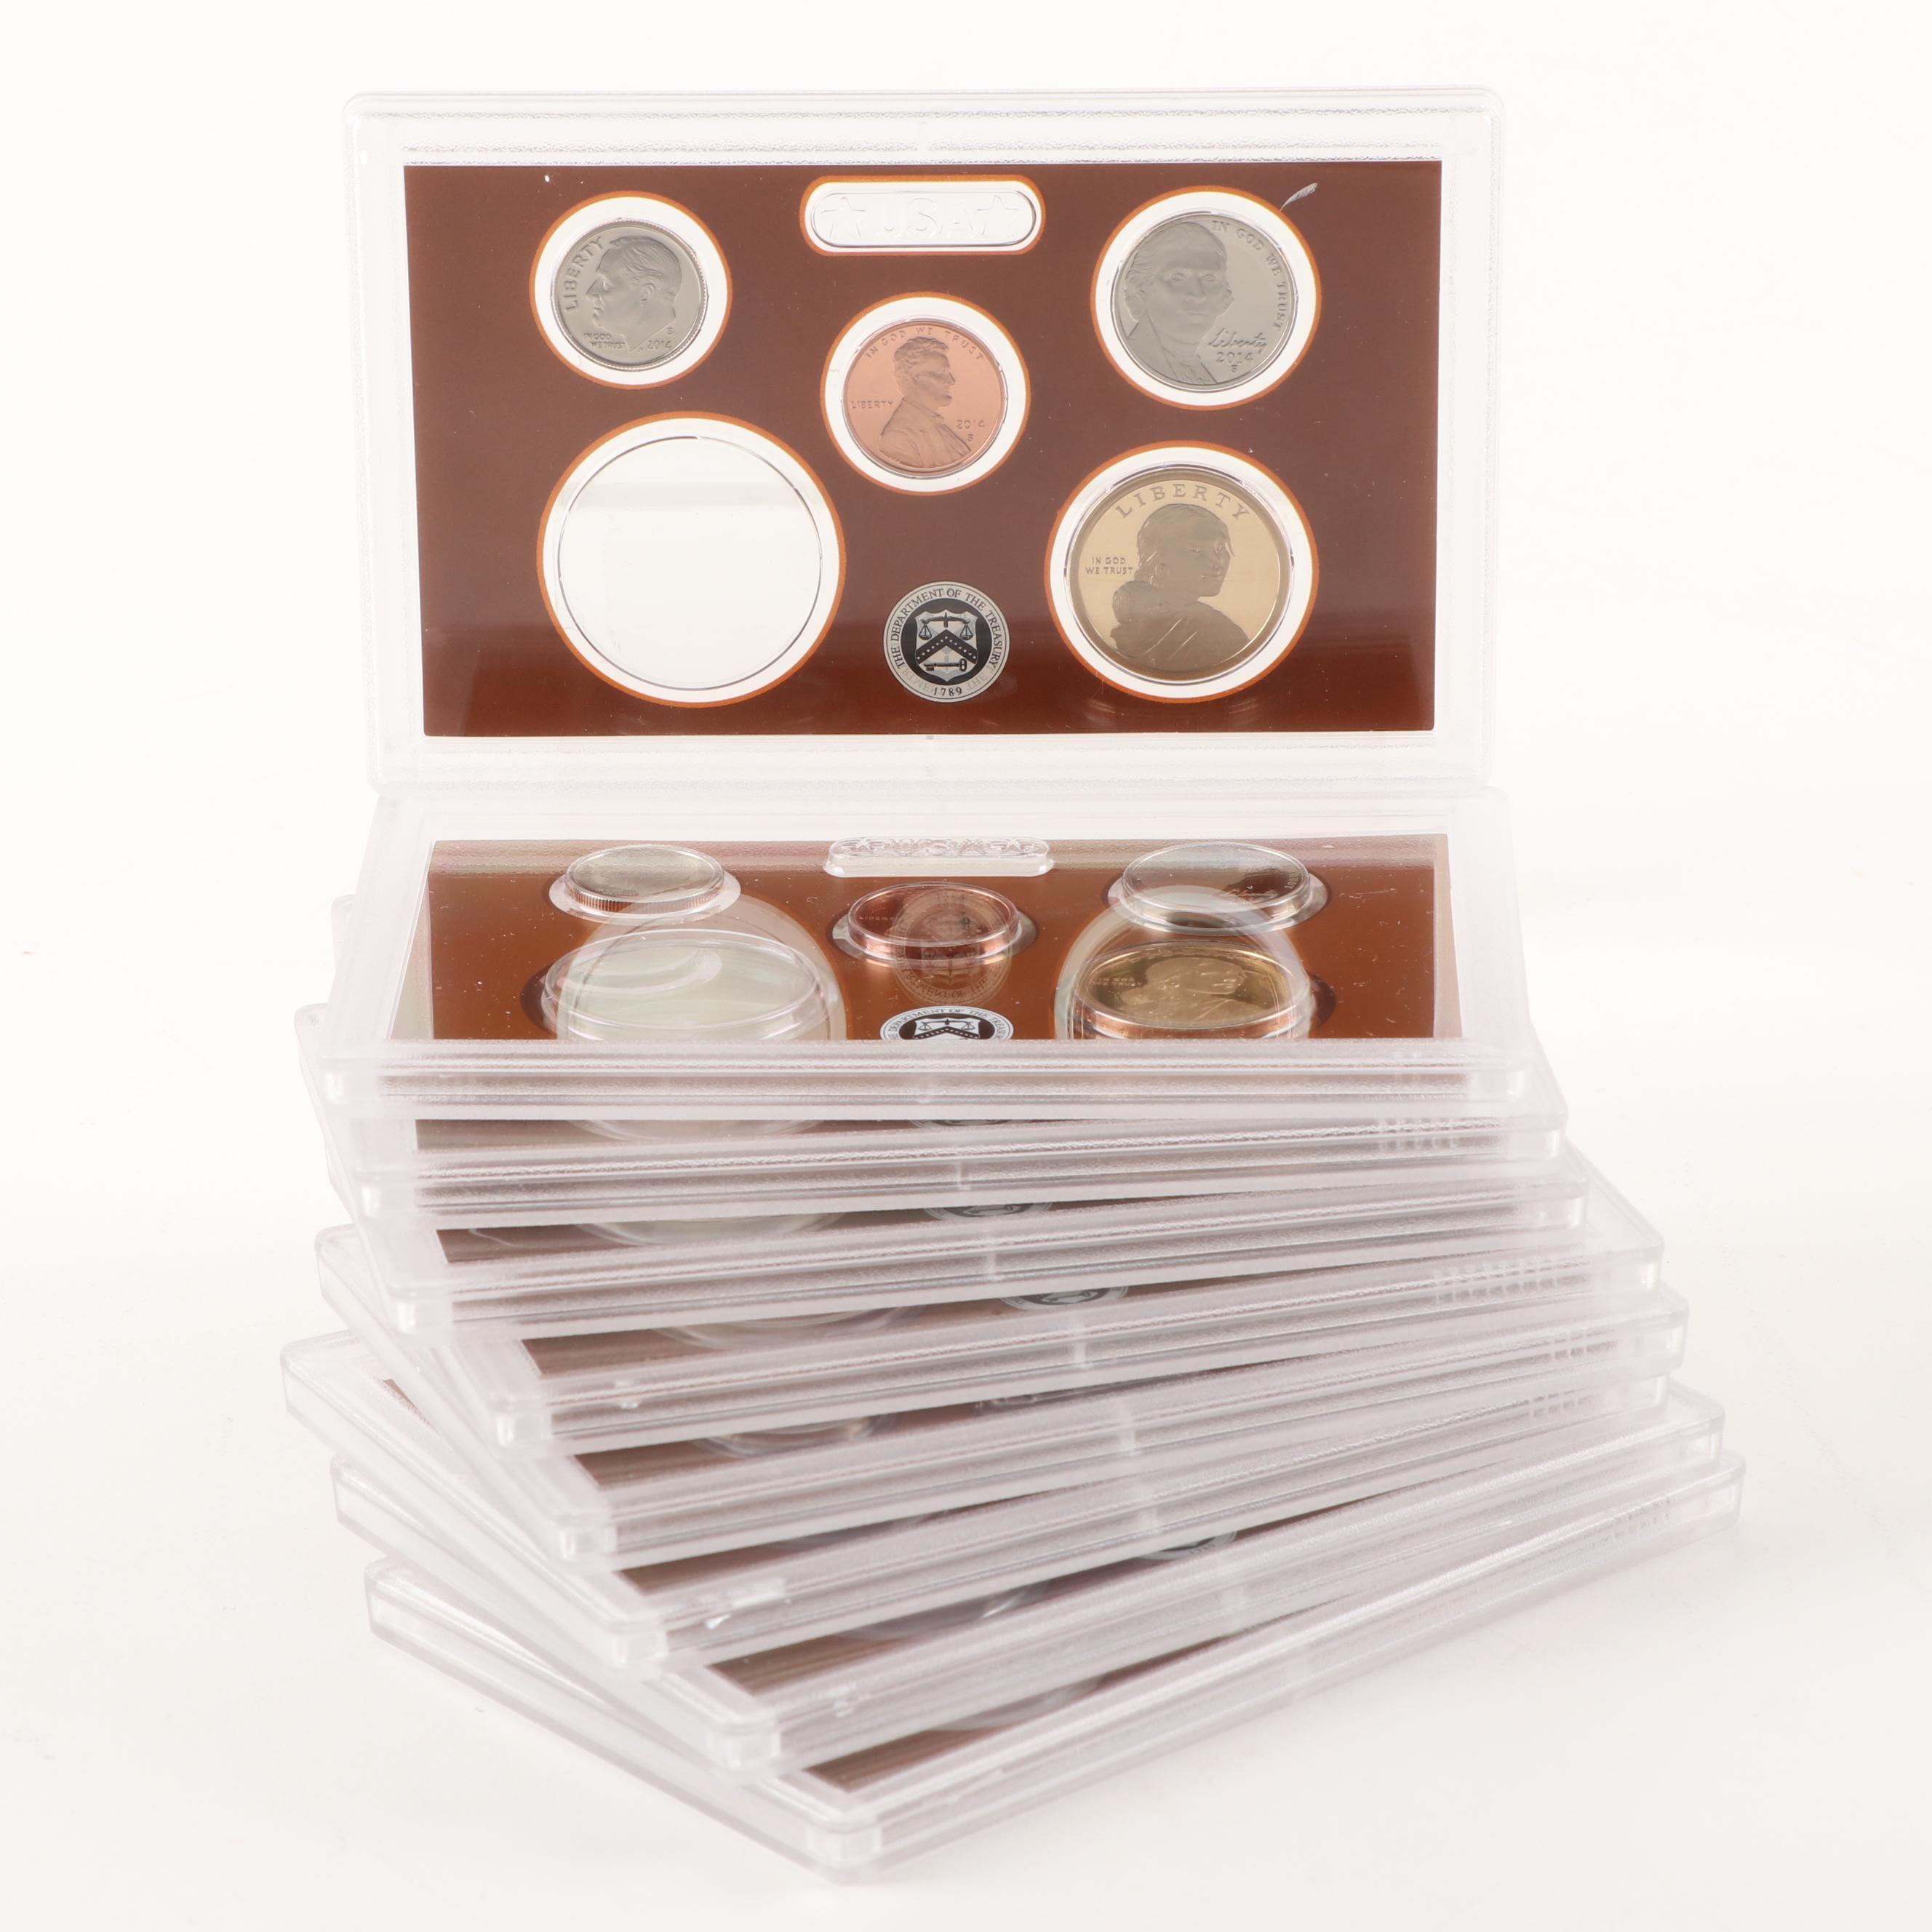 Group of Nine United States Mint 2014 Proof Sets